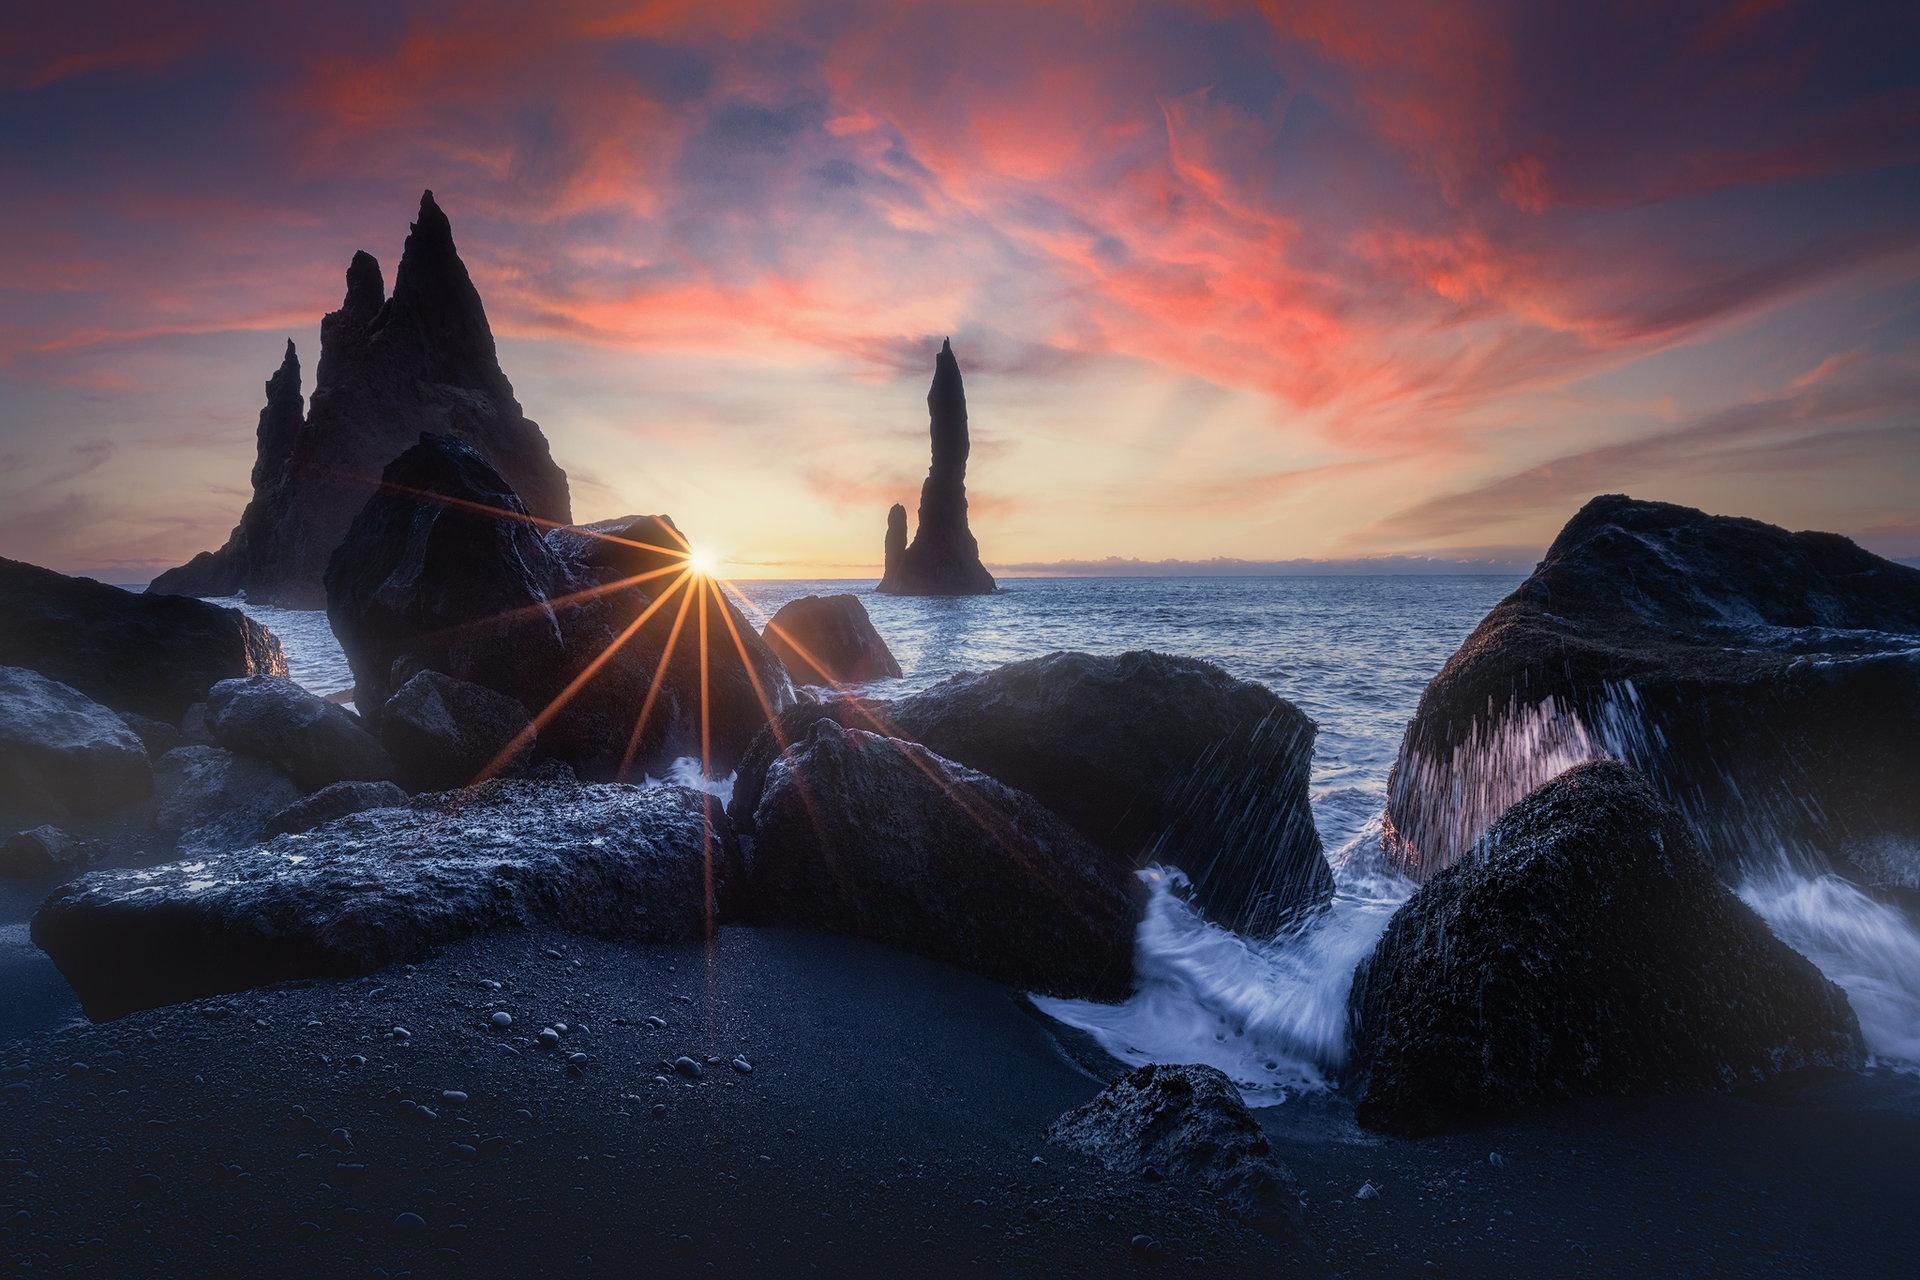 По Изгрев | Author Remo Daut - wallburn | PHOTO FORUM